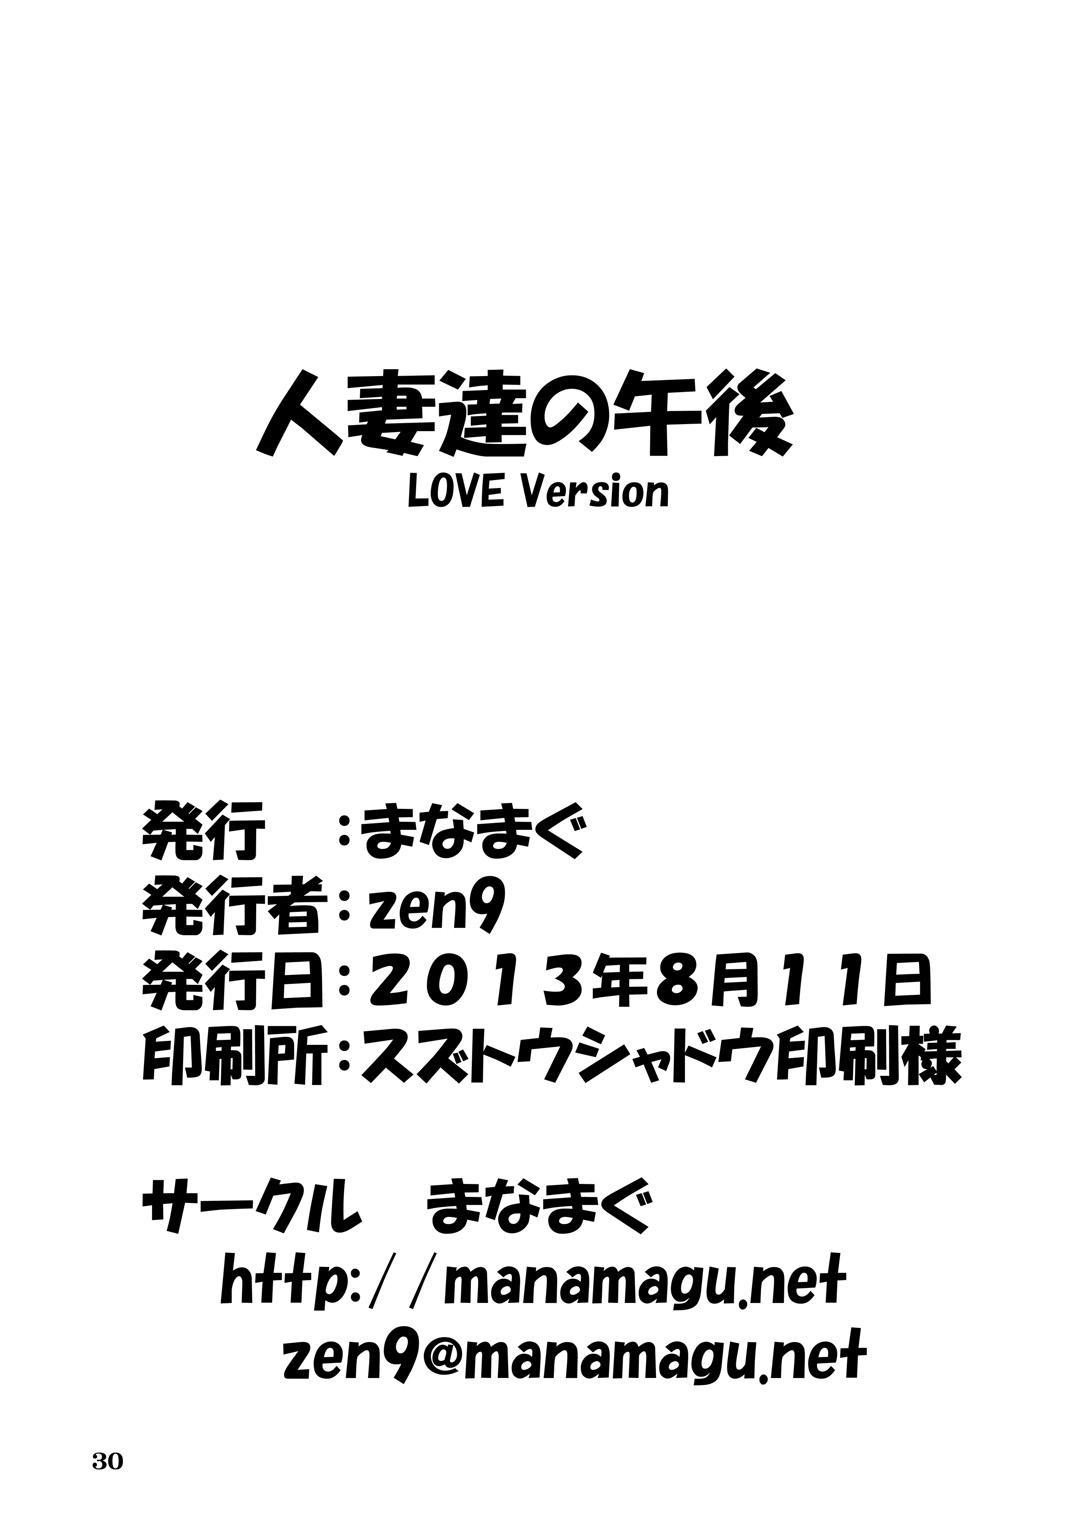 [Manamagu (zen9)] Hitozuma-tachi no Gogo - LOVE Version (Various) [Digital] 28